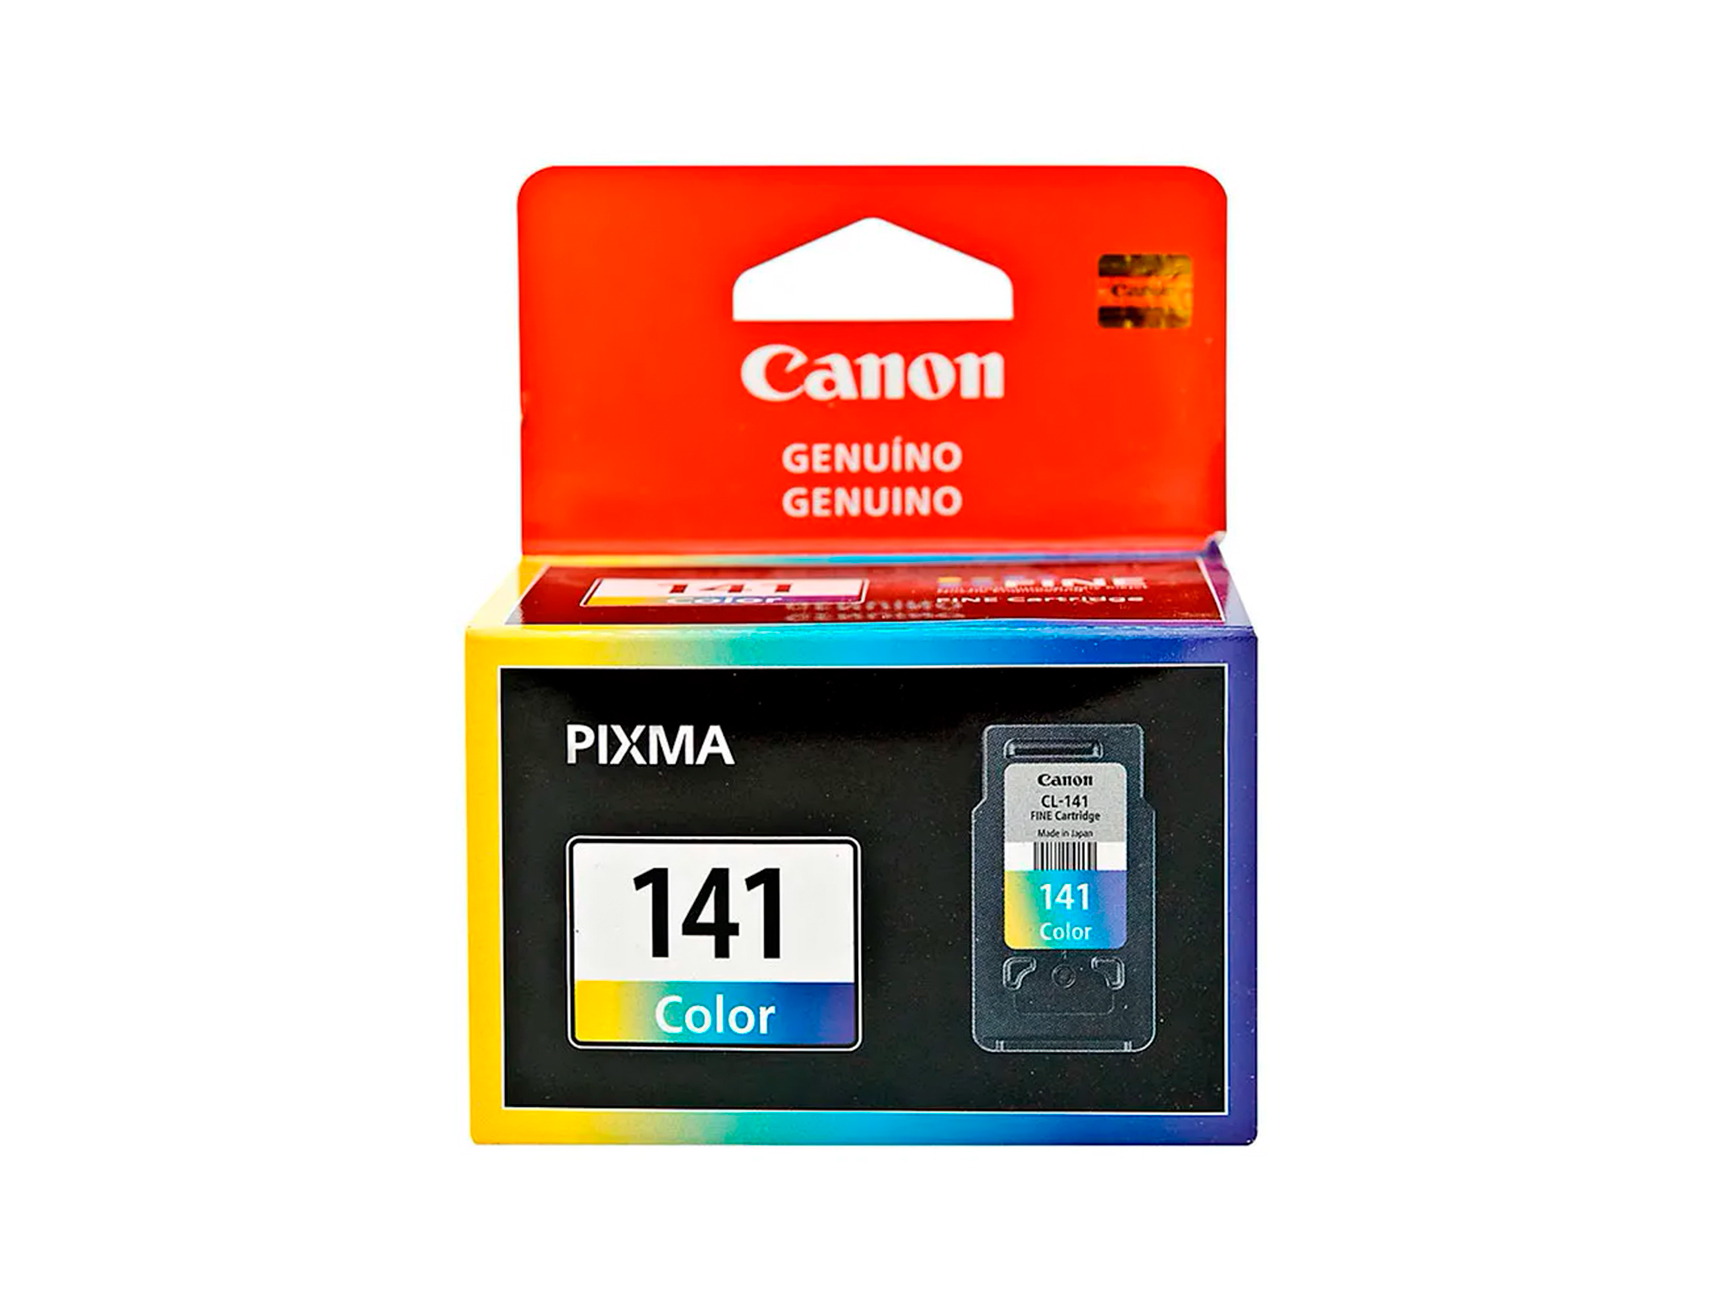 CARTUCHO CANON  141 ( 5203B012AA ) COLOR - MG2110 / MG3110 / MG3510 + / + PACK 10 HOJAS FOTOGRAFICOS